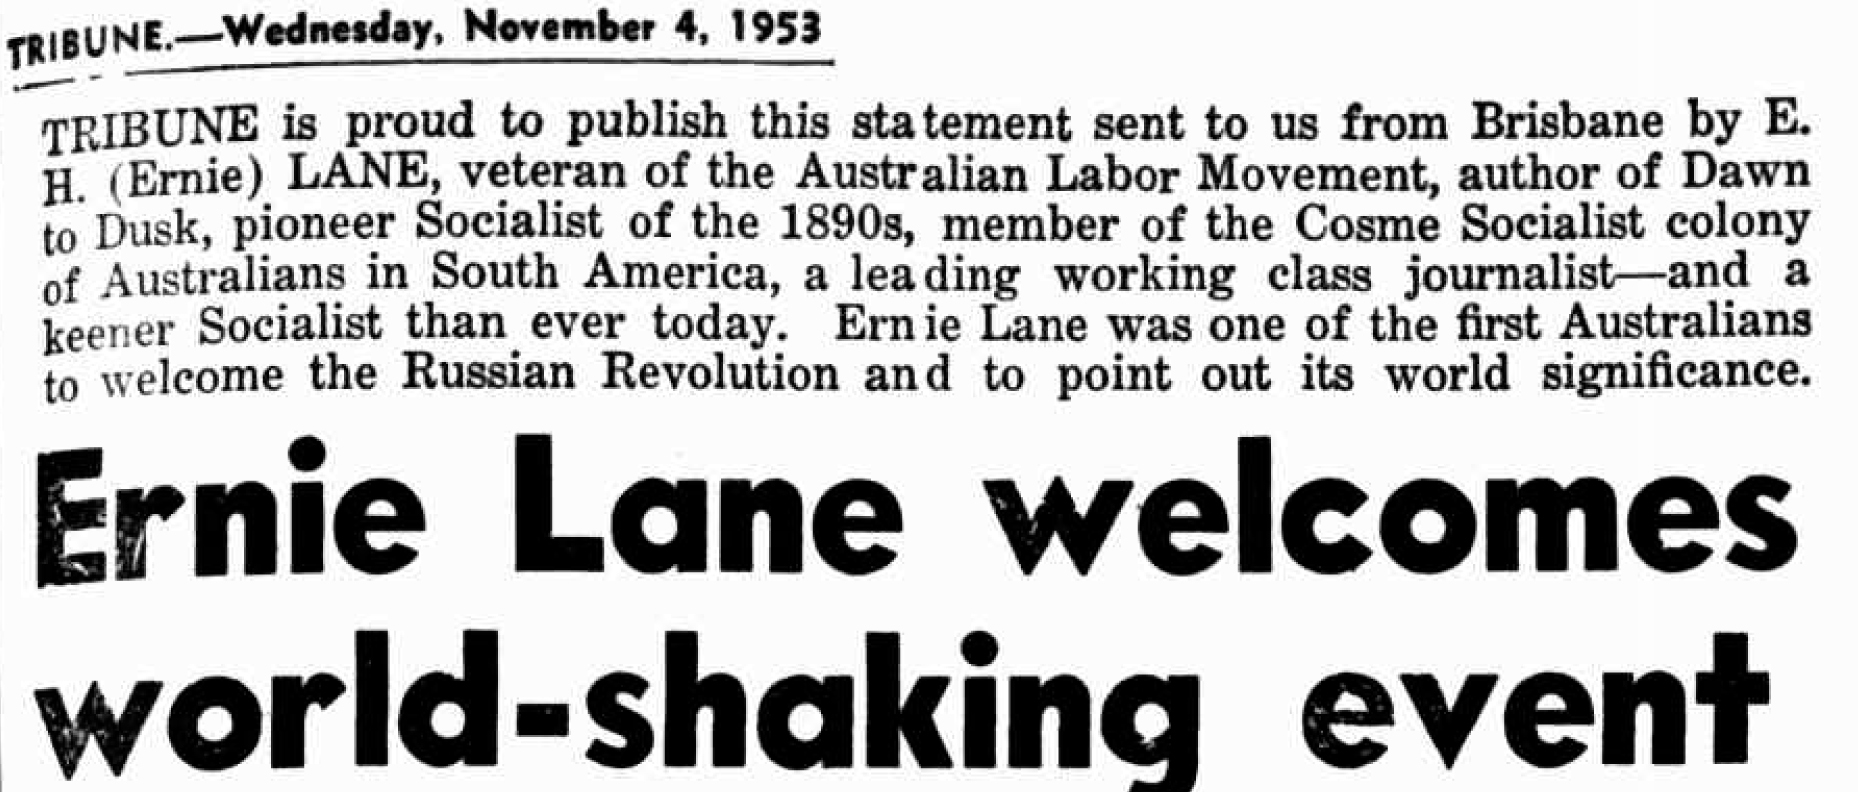 ernie lane tribune nov 4 1953